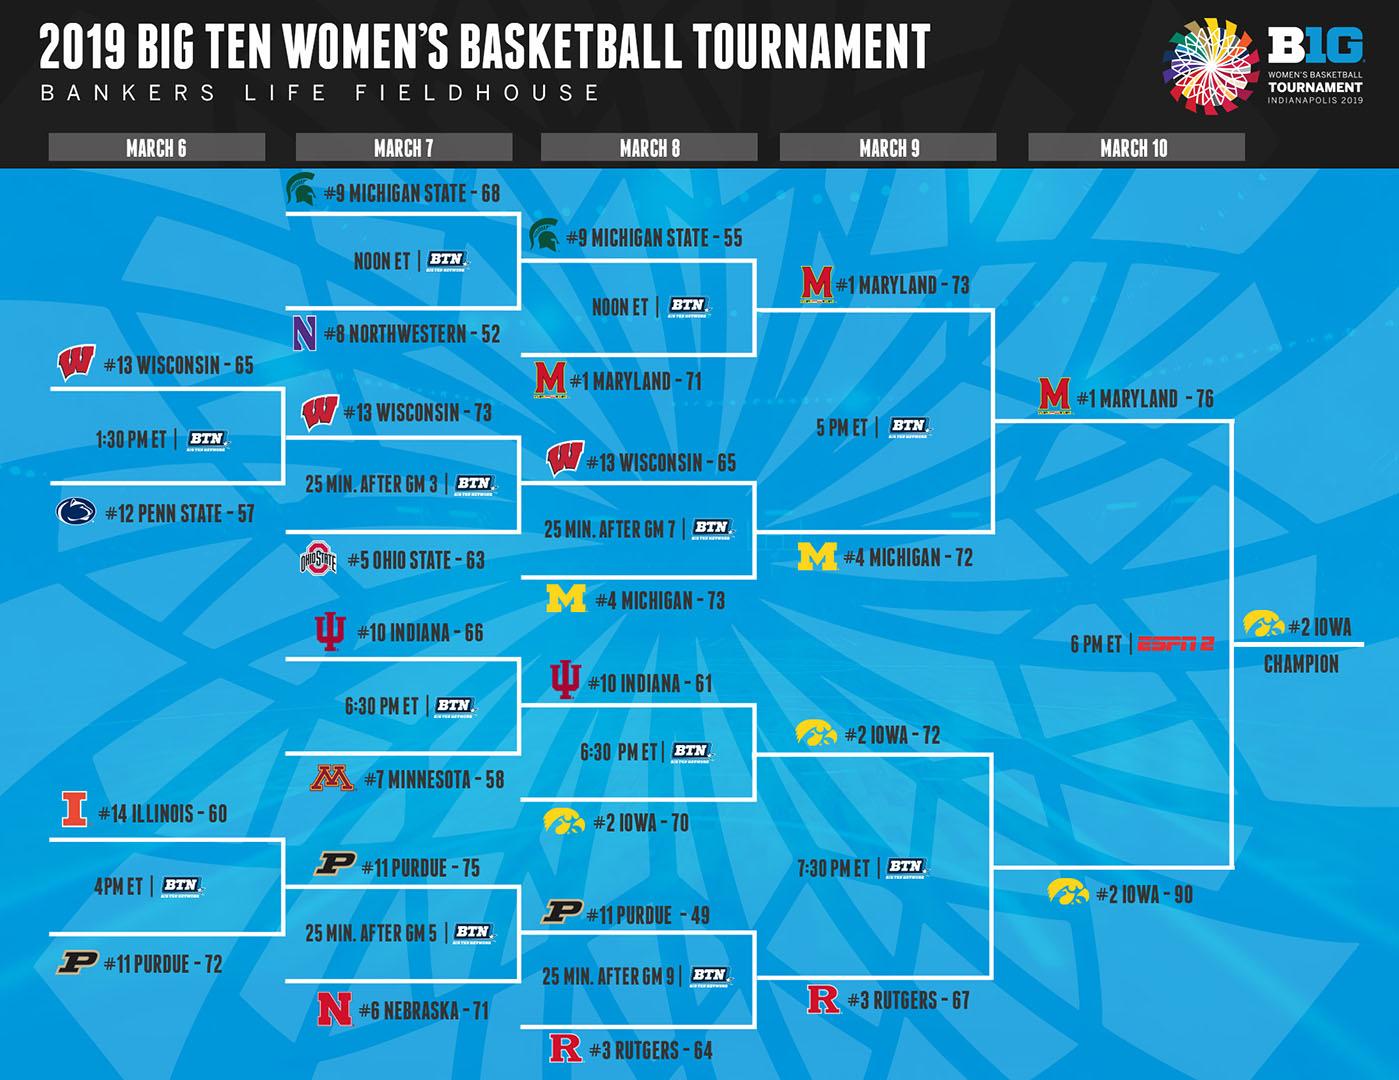 Big Ten Basketball Schedule 2019 2019 Big Ten Women's Basketball Tournament   Big Ten Conference